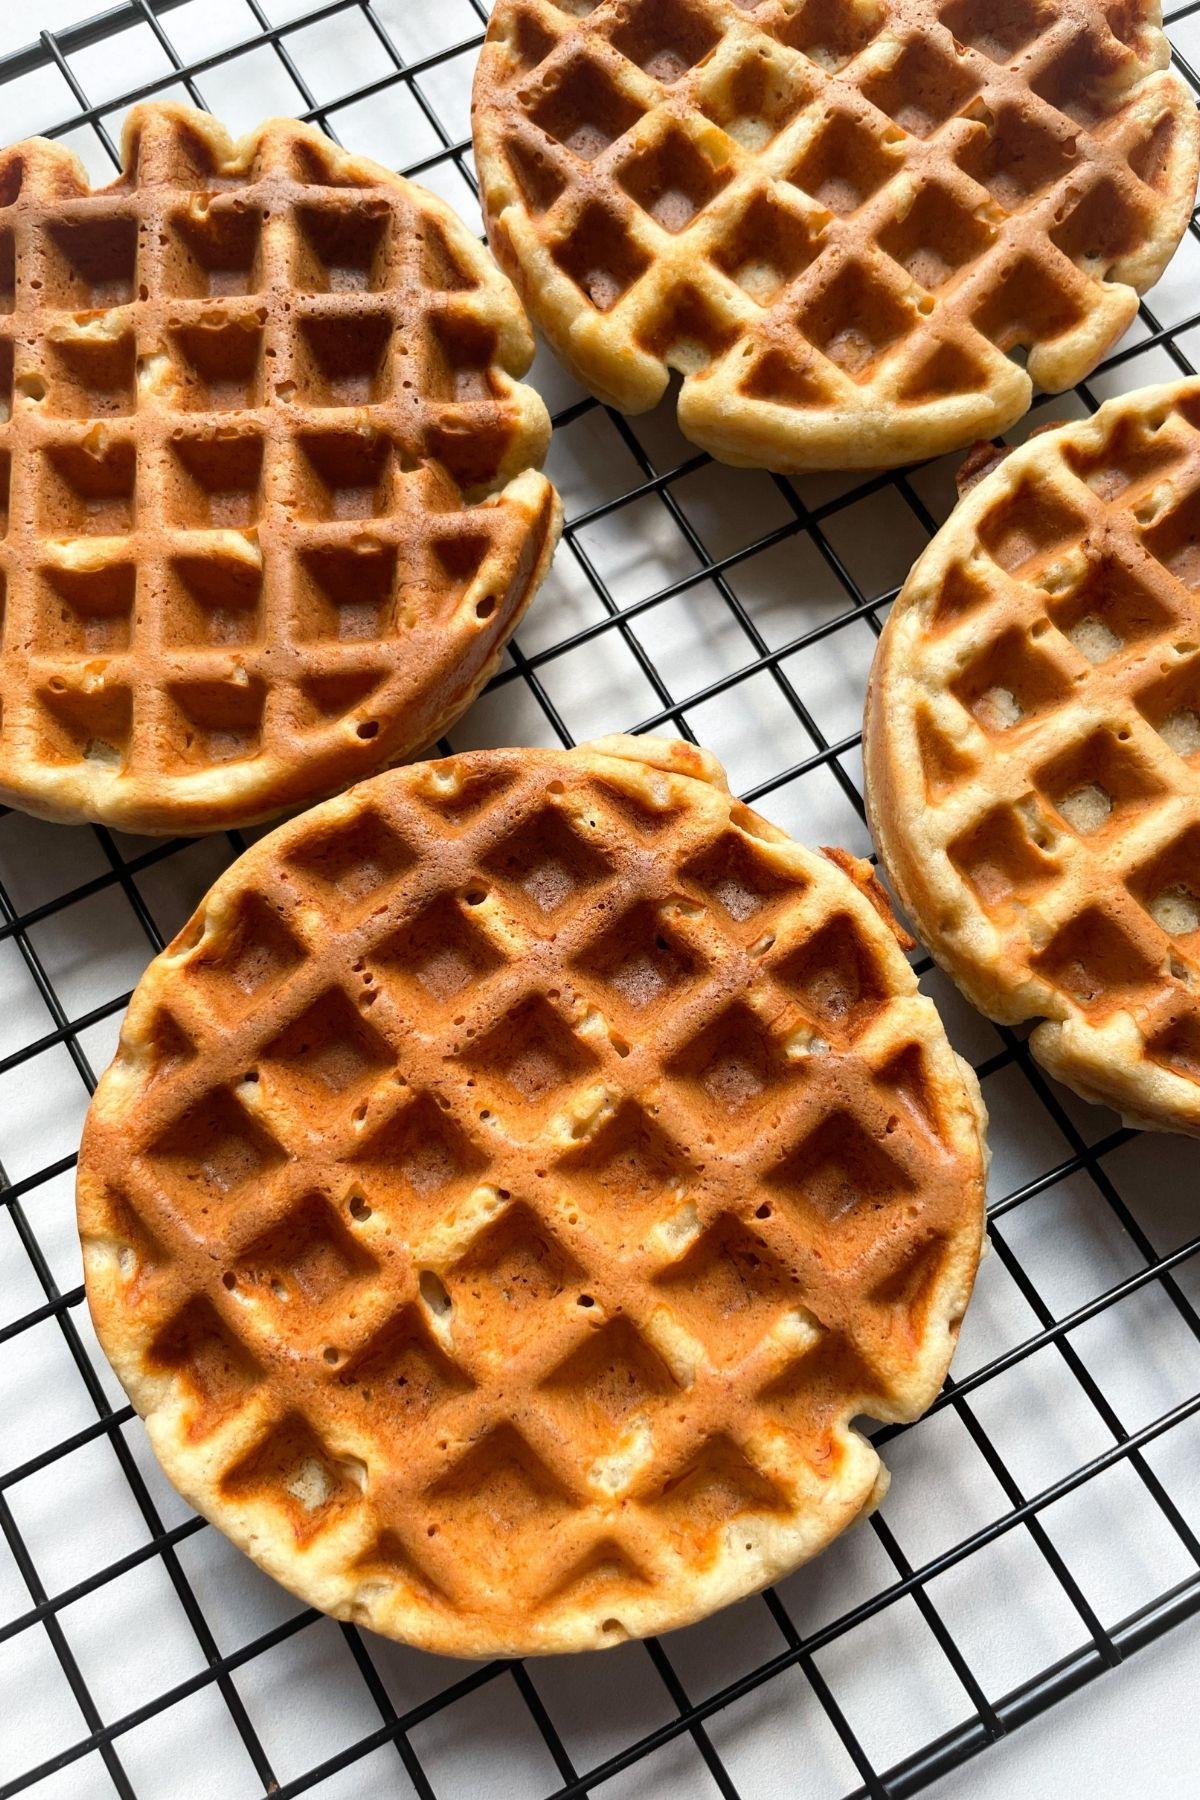 waffles on cooling rack